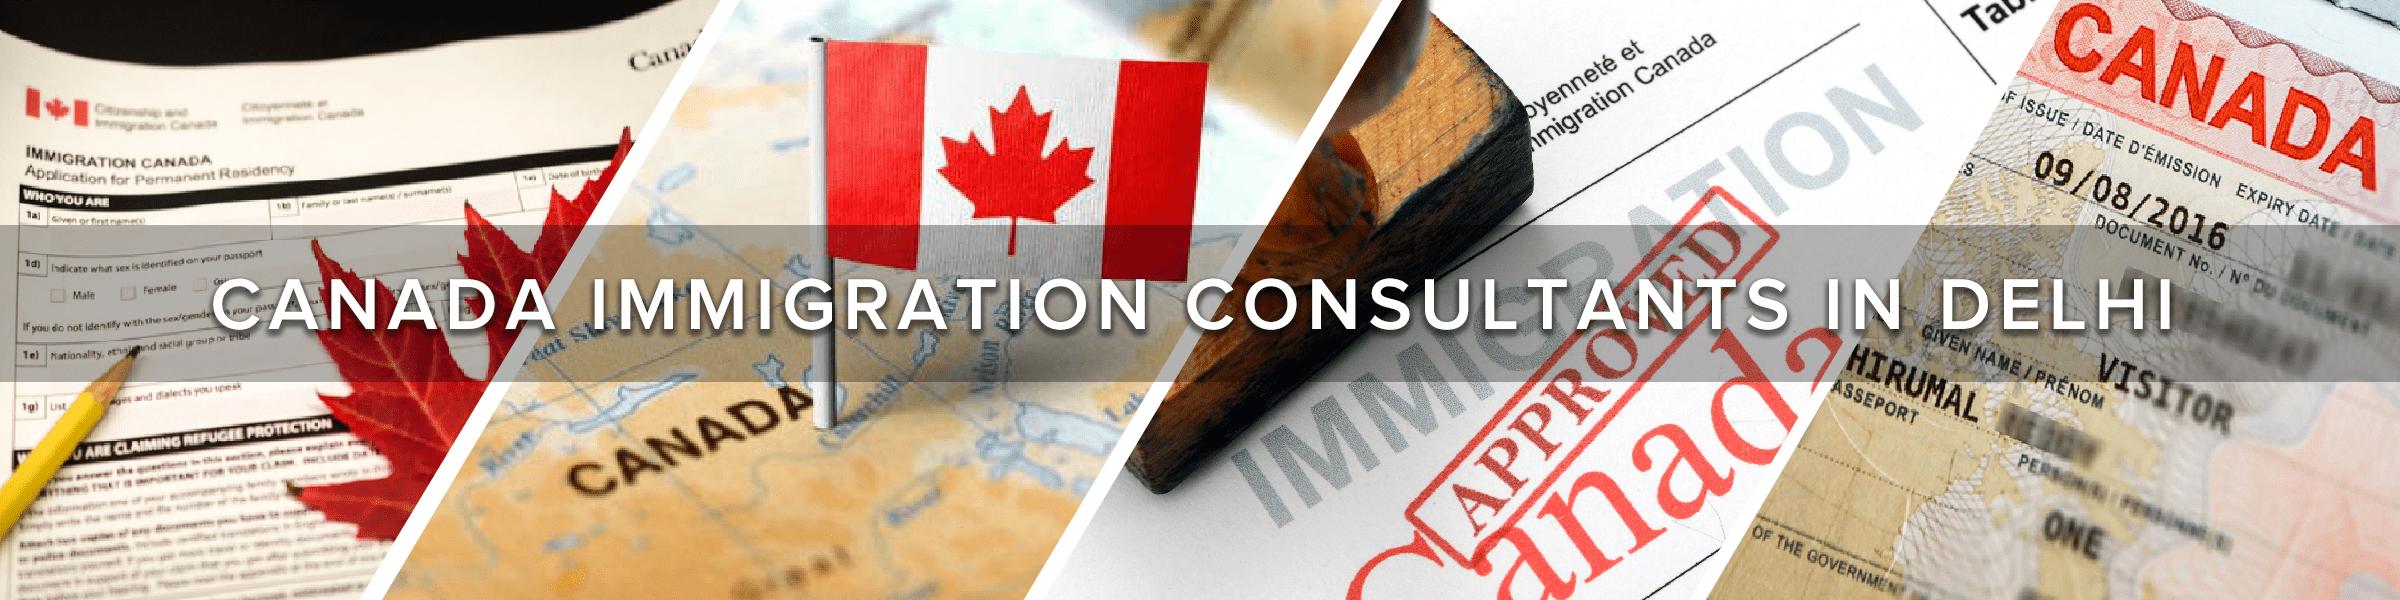 Canada Immigration Consultant In Delhi